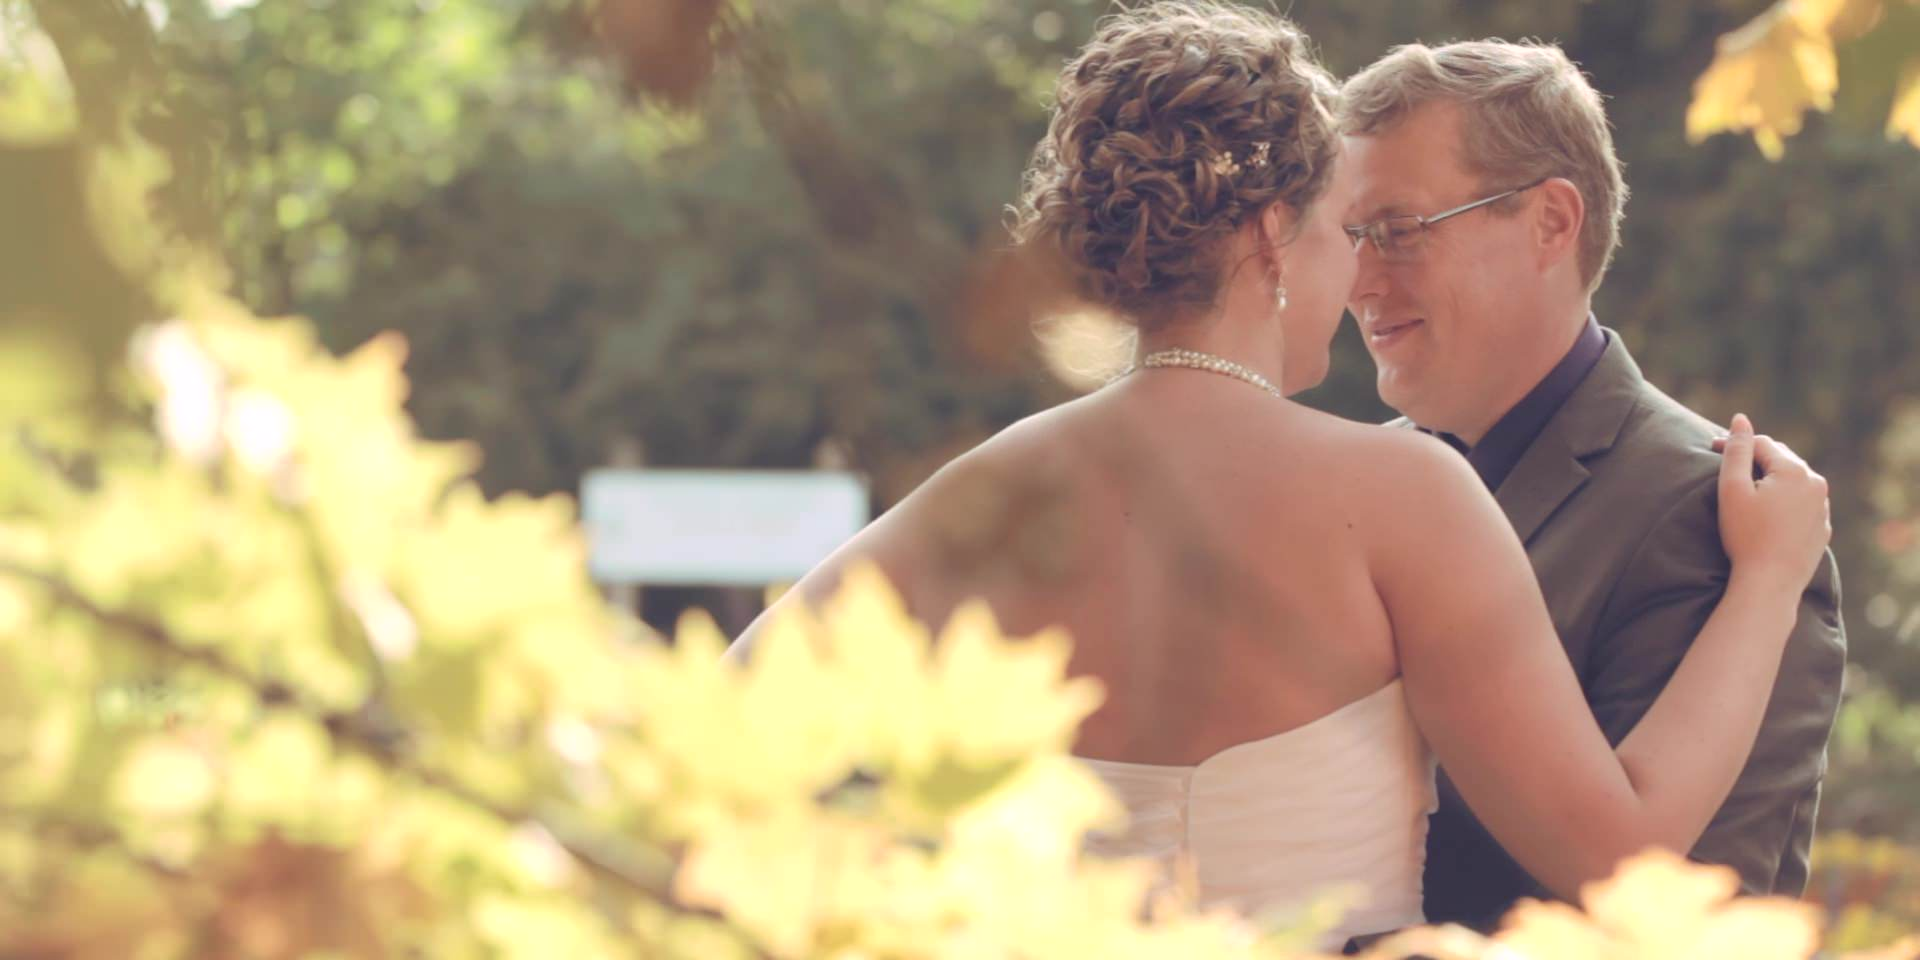 eric&lindsey wedding story.mp4-still00010.jpg